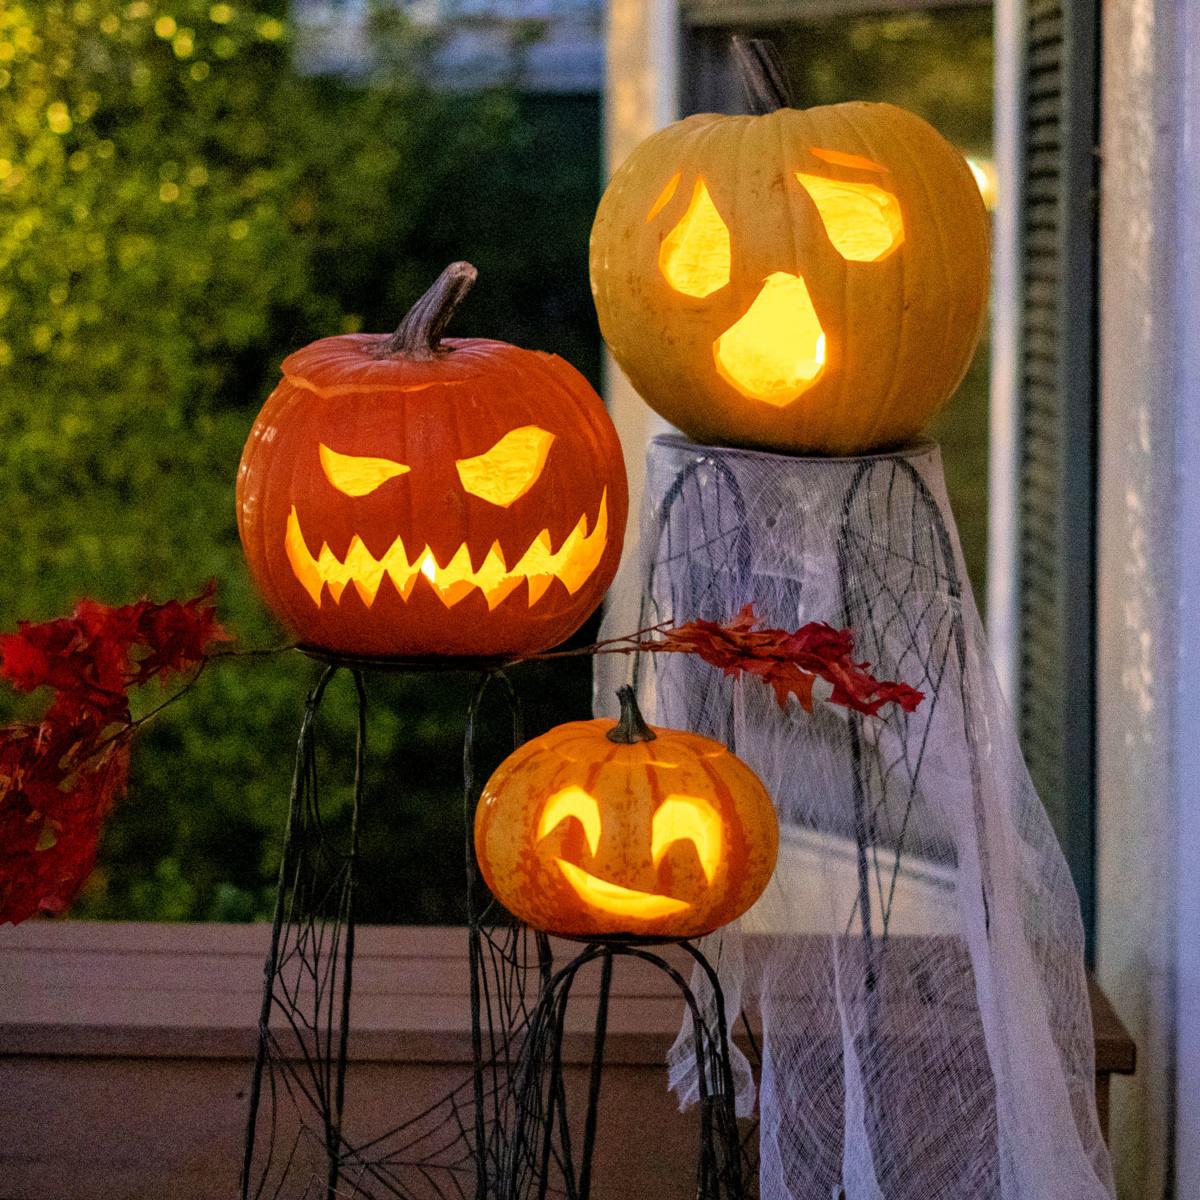 My wonky little family of Halloween pumpkins. Details at une femme d'un certain age.